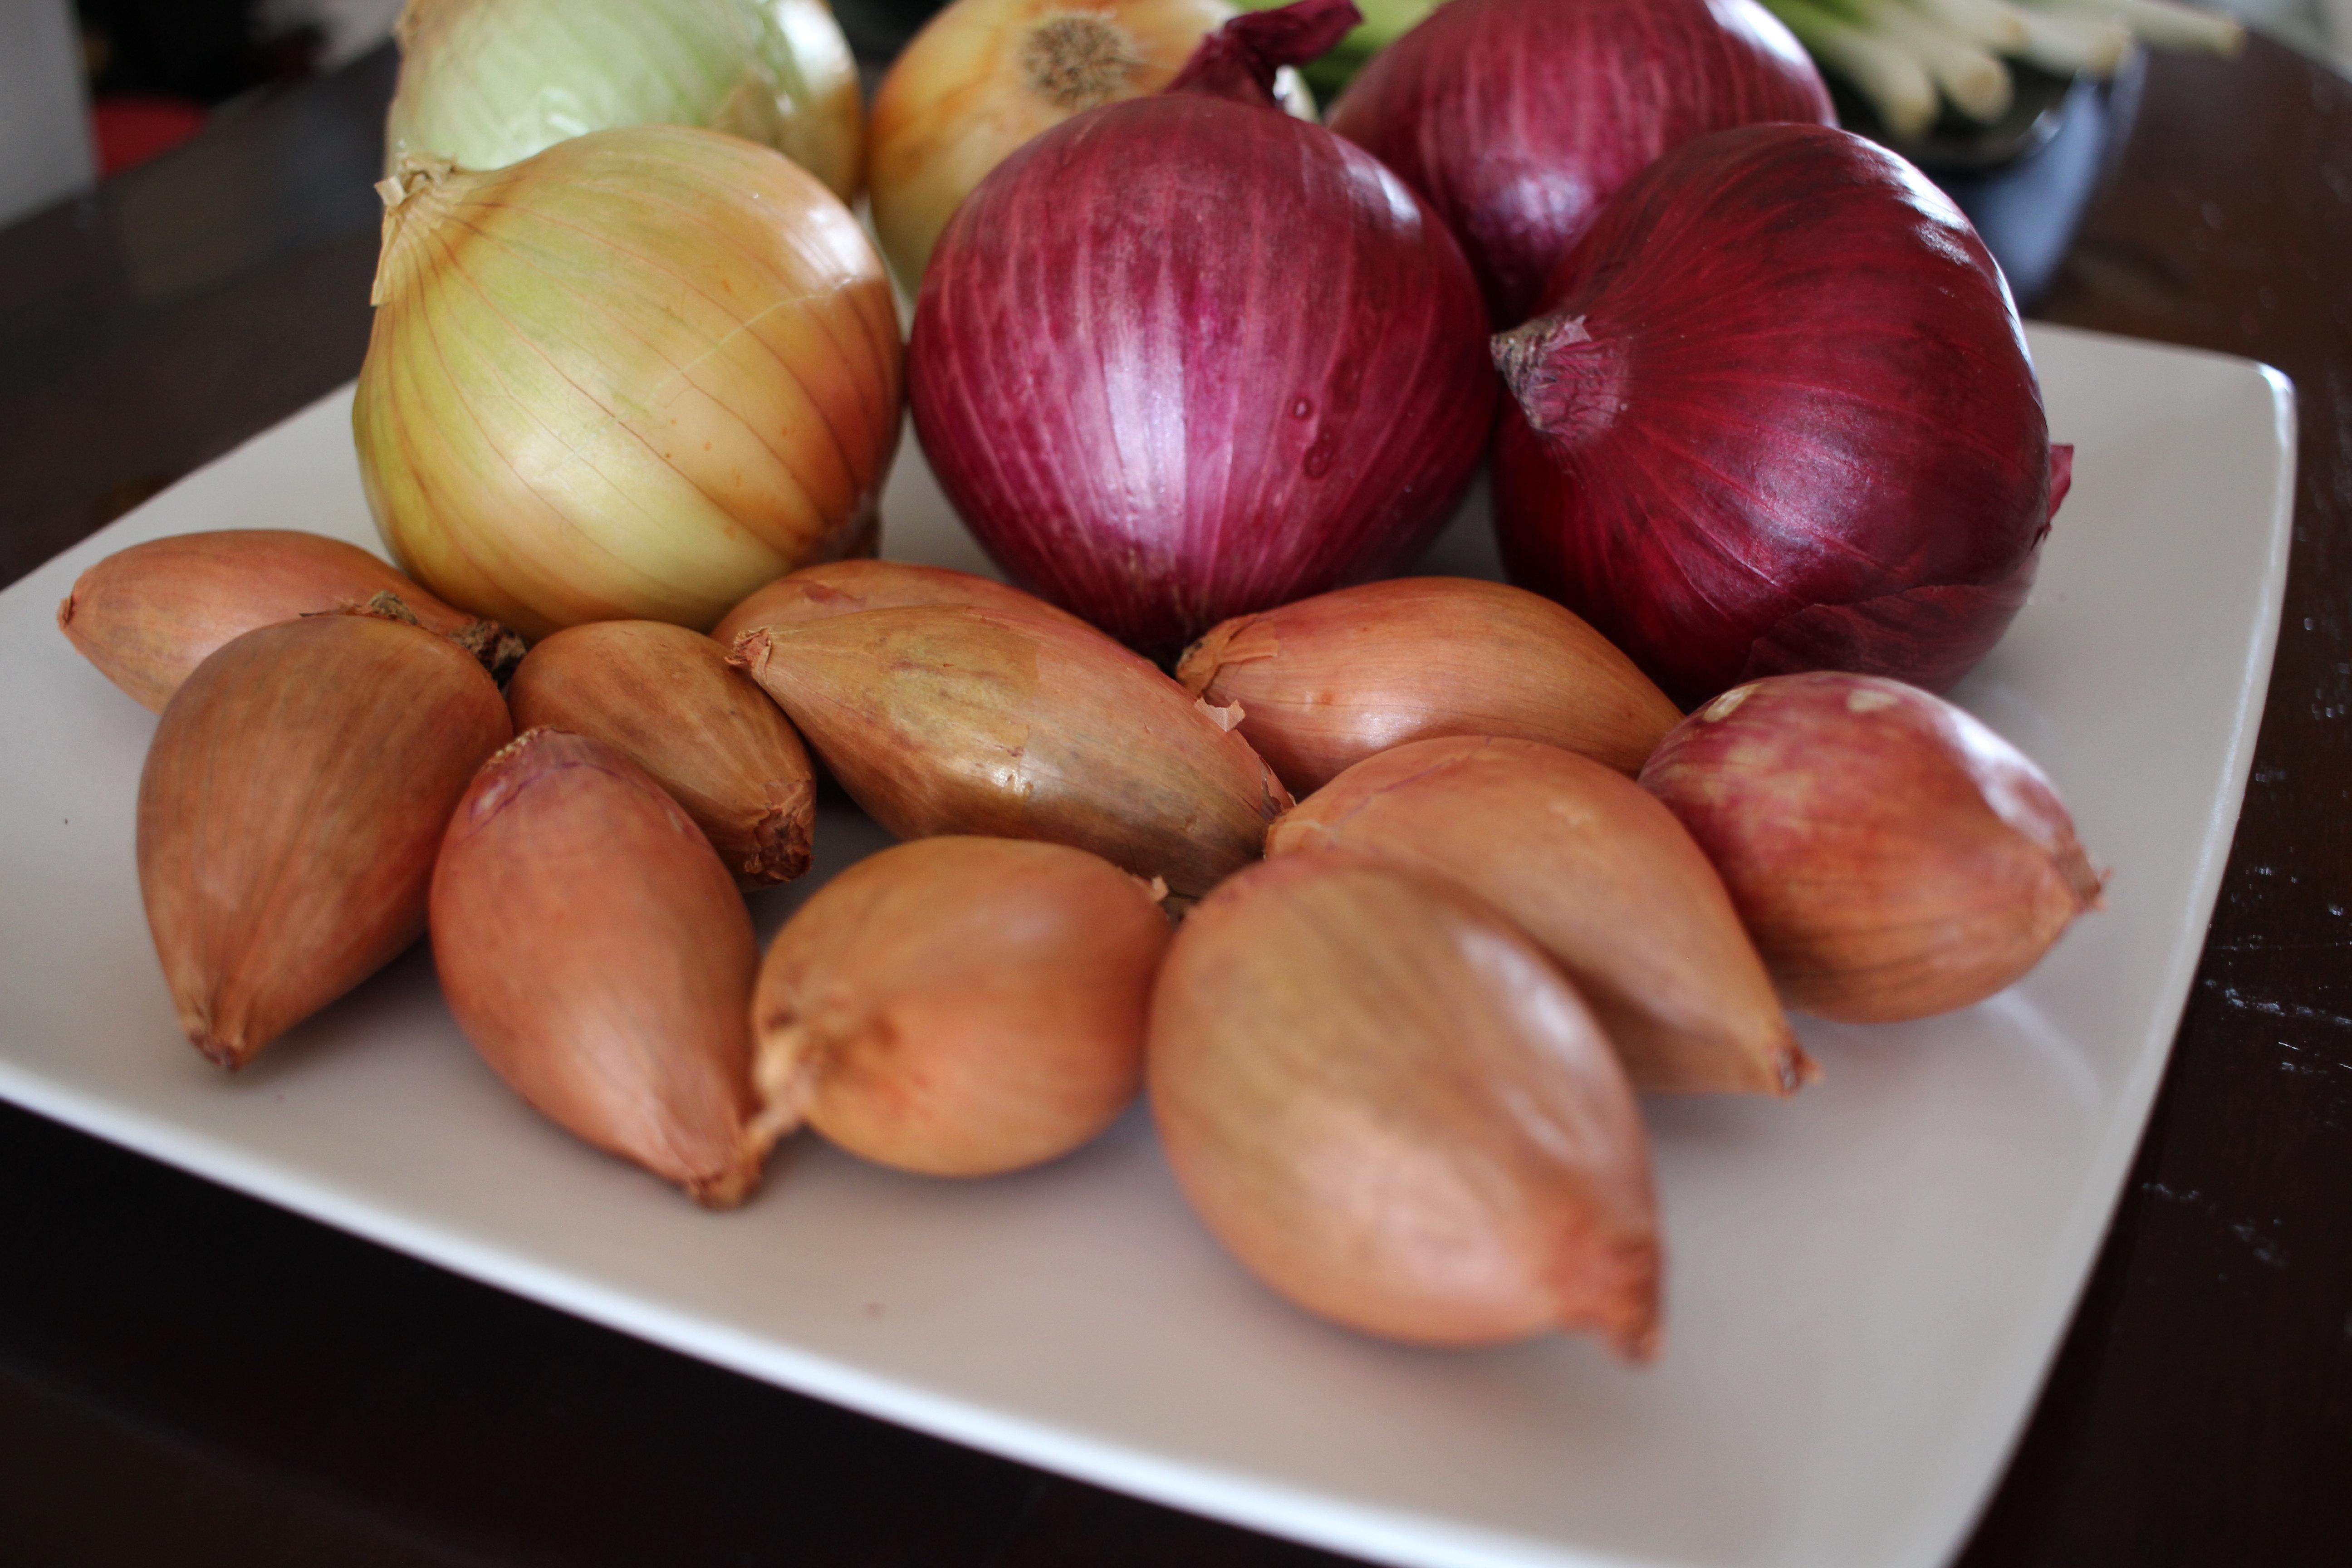 Onion peel in folk medicine. The use of onion peel in folk medicine 25